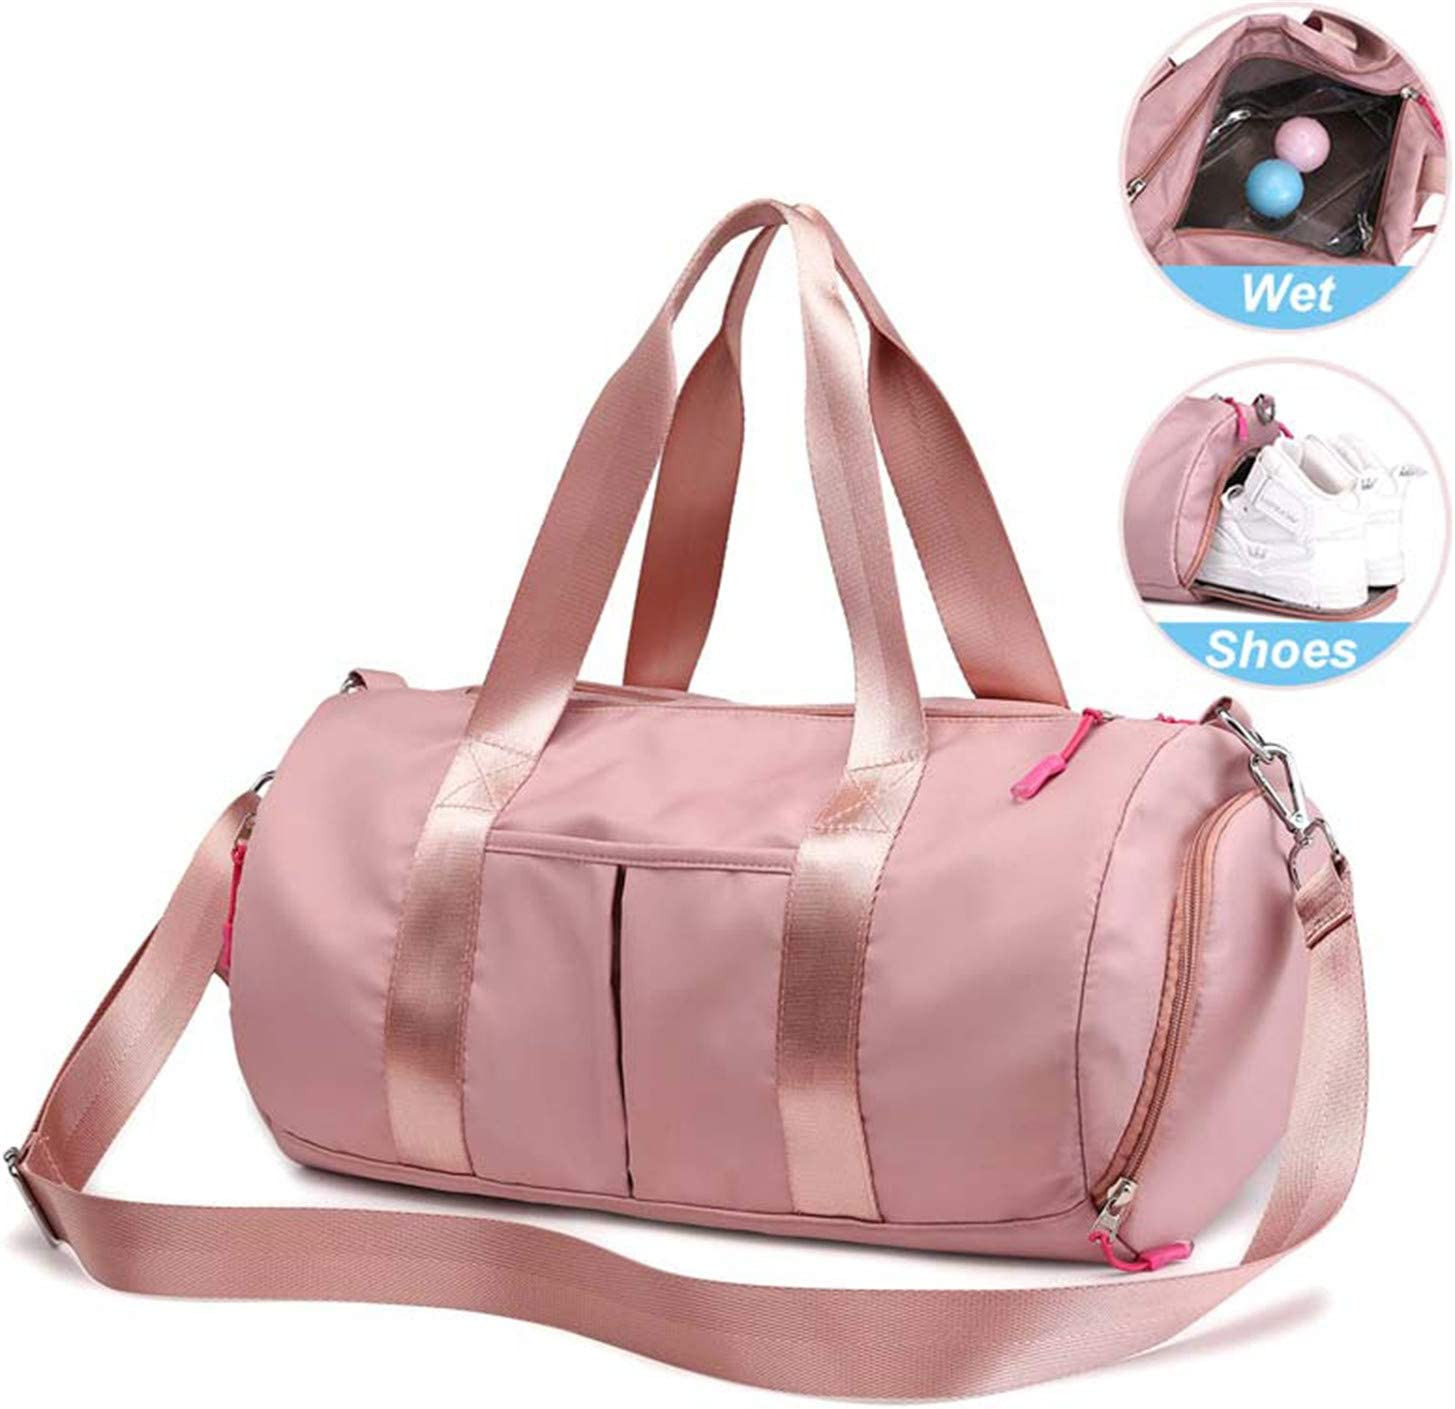 Pink Dry Wet Bag Fitness Gym Bags For Women Men Yoga Mat Tas Travel Training Sac De Sport Gymtas Sac De Sport Sporttas New XA85A Black M